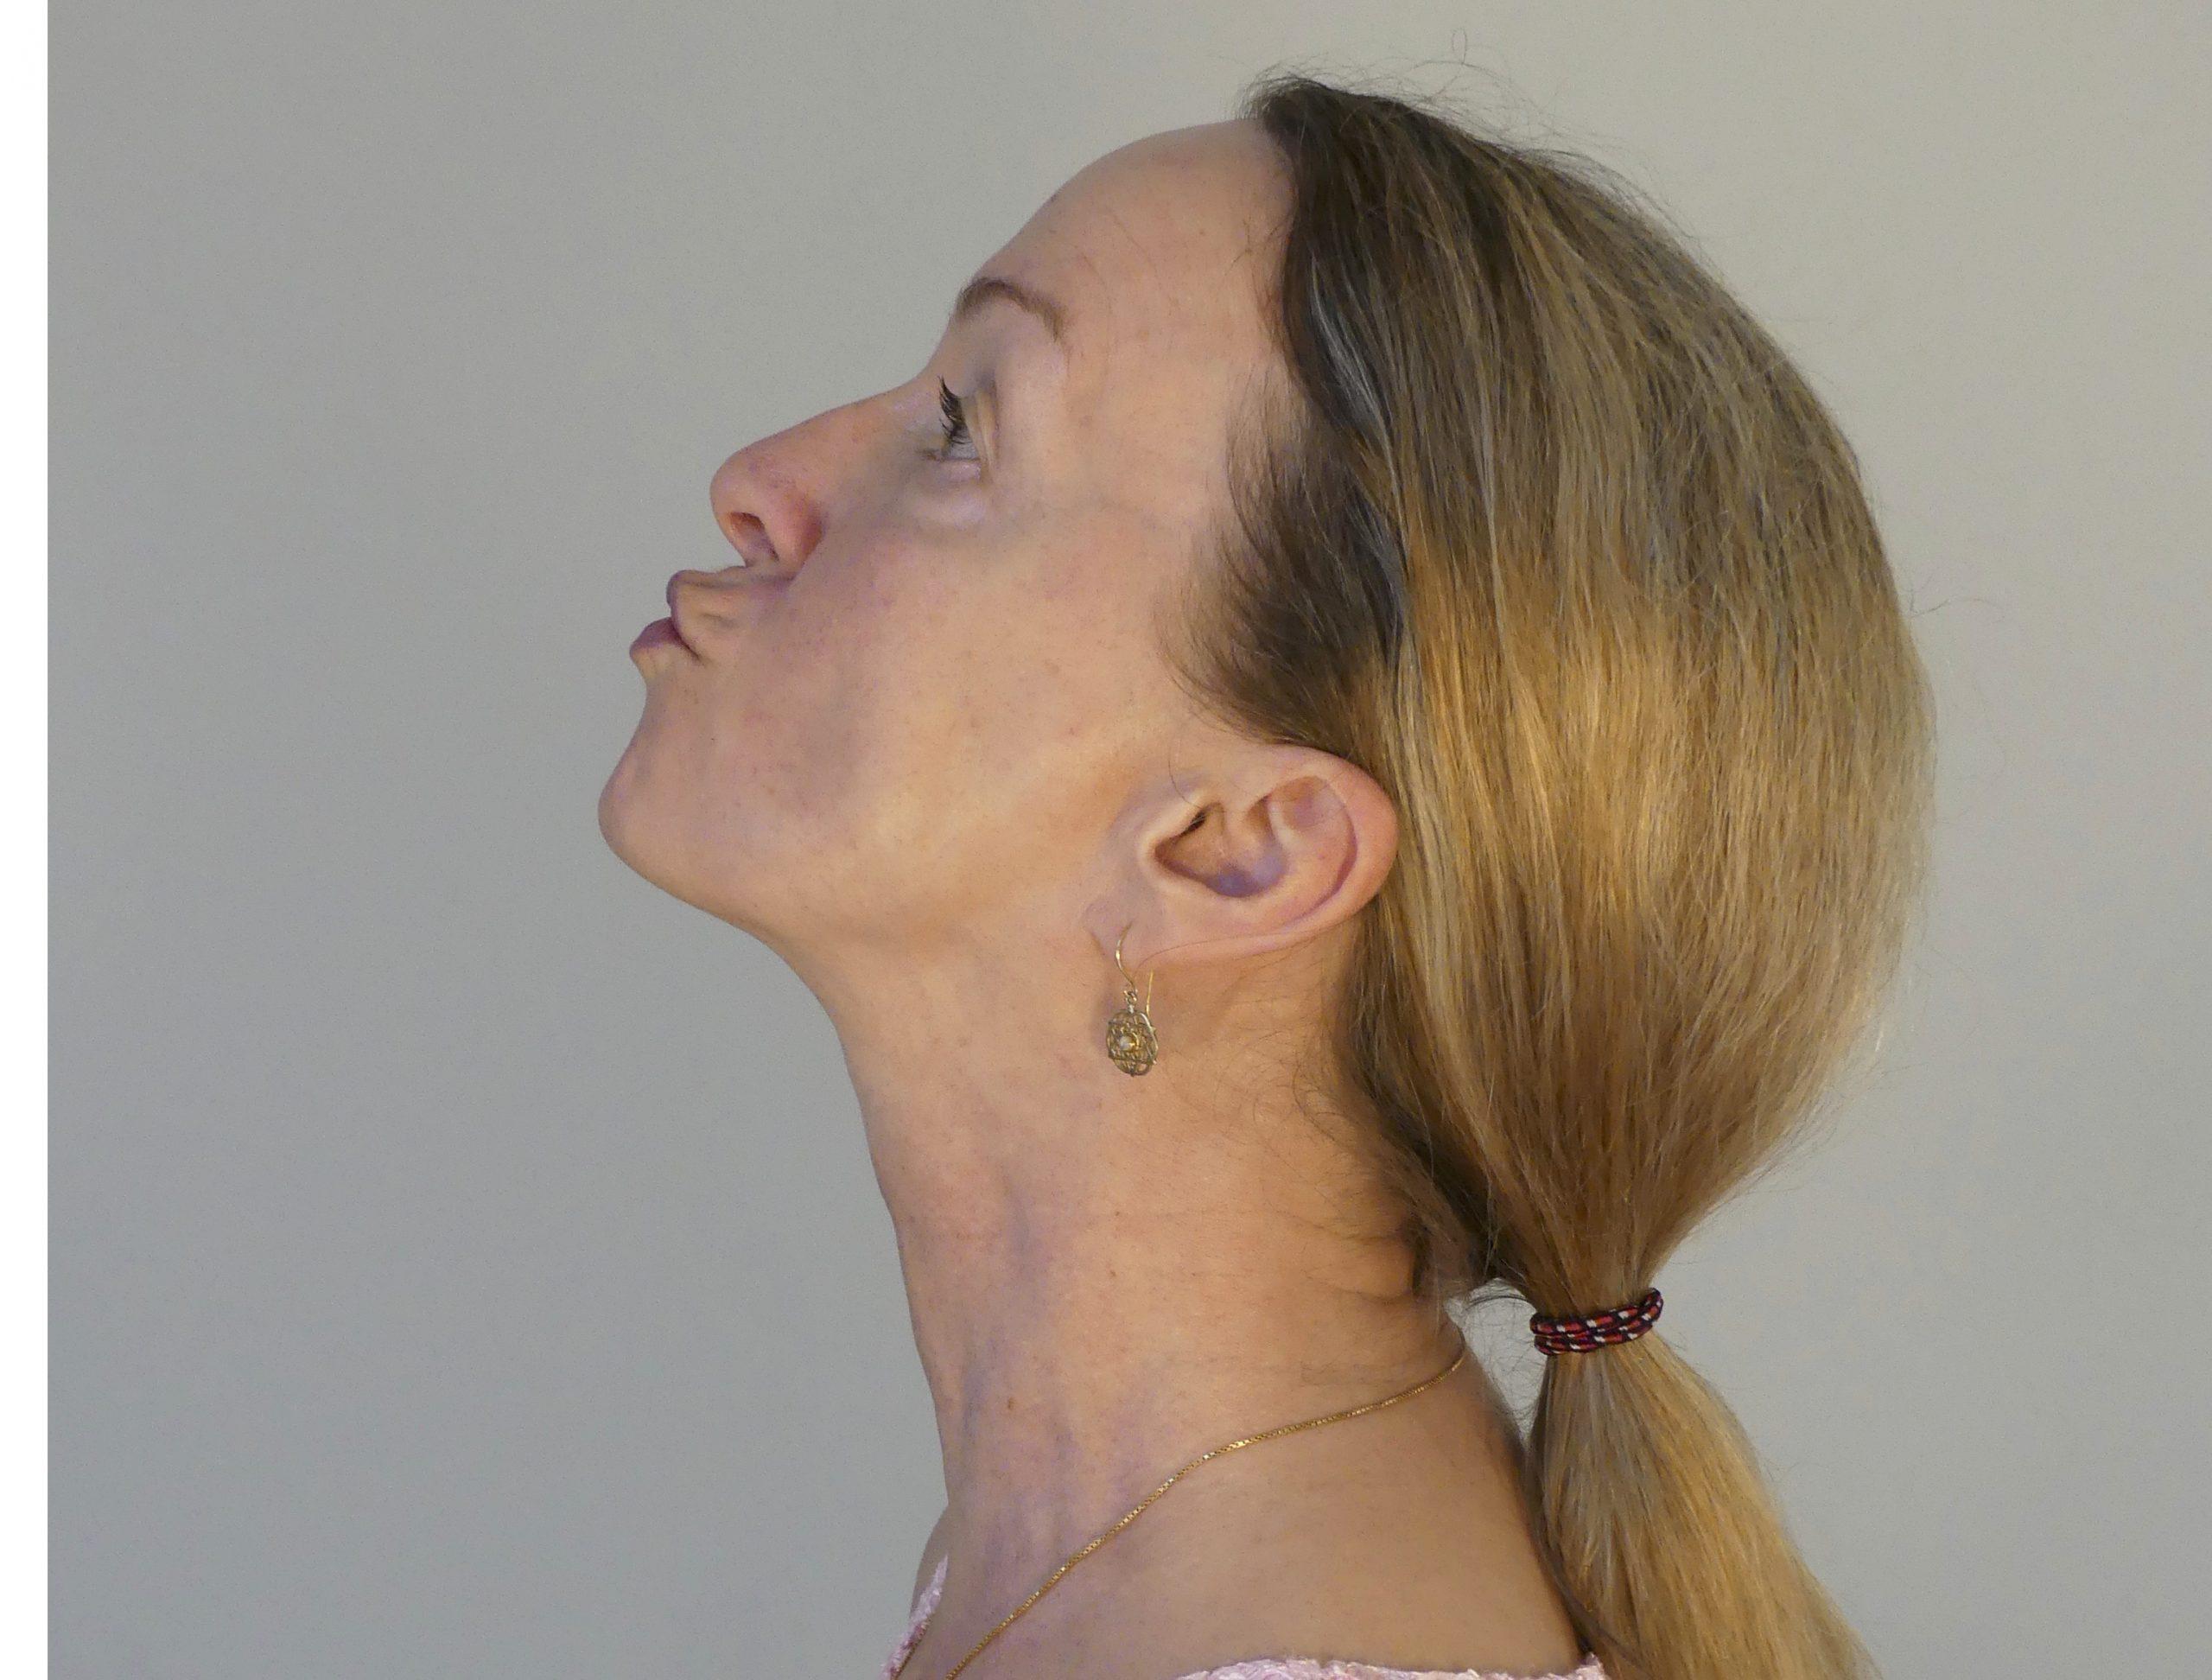 Lift Neck & Jawline with Face Yoga Australia